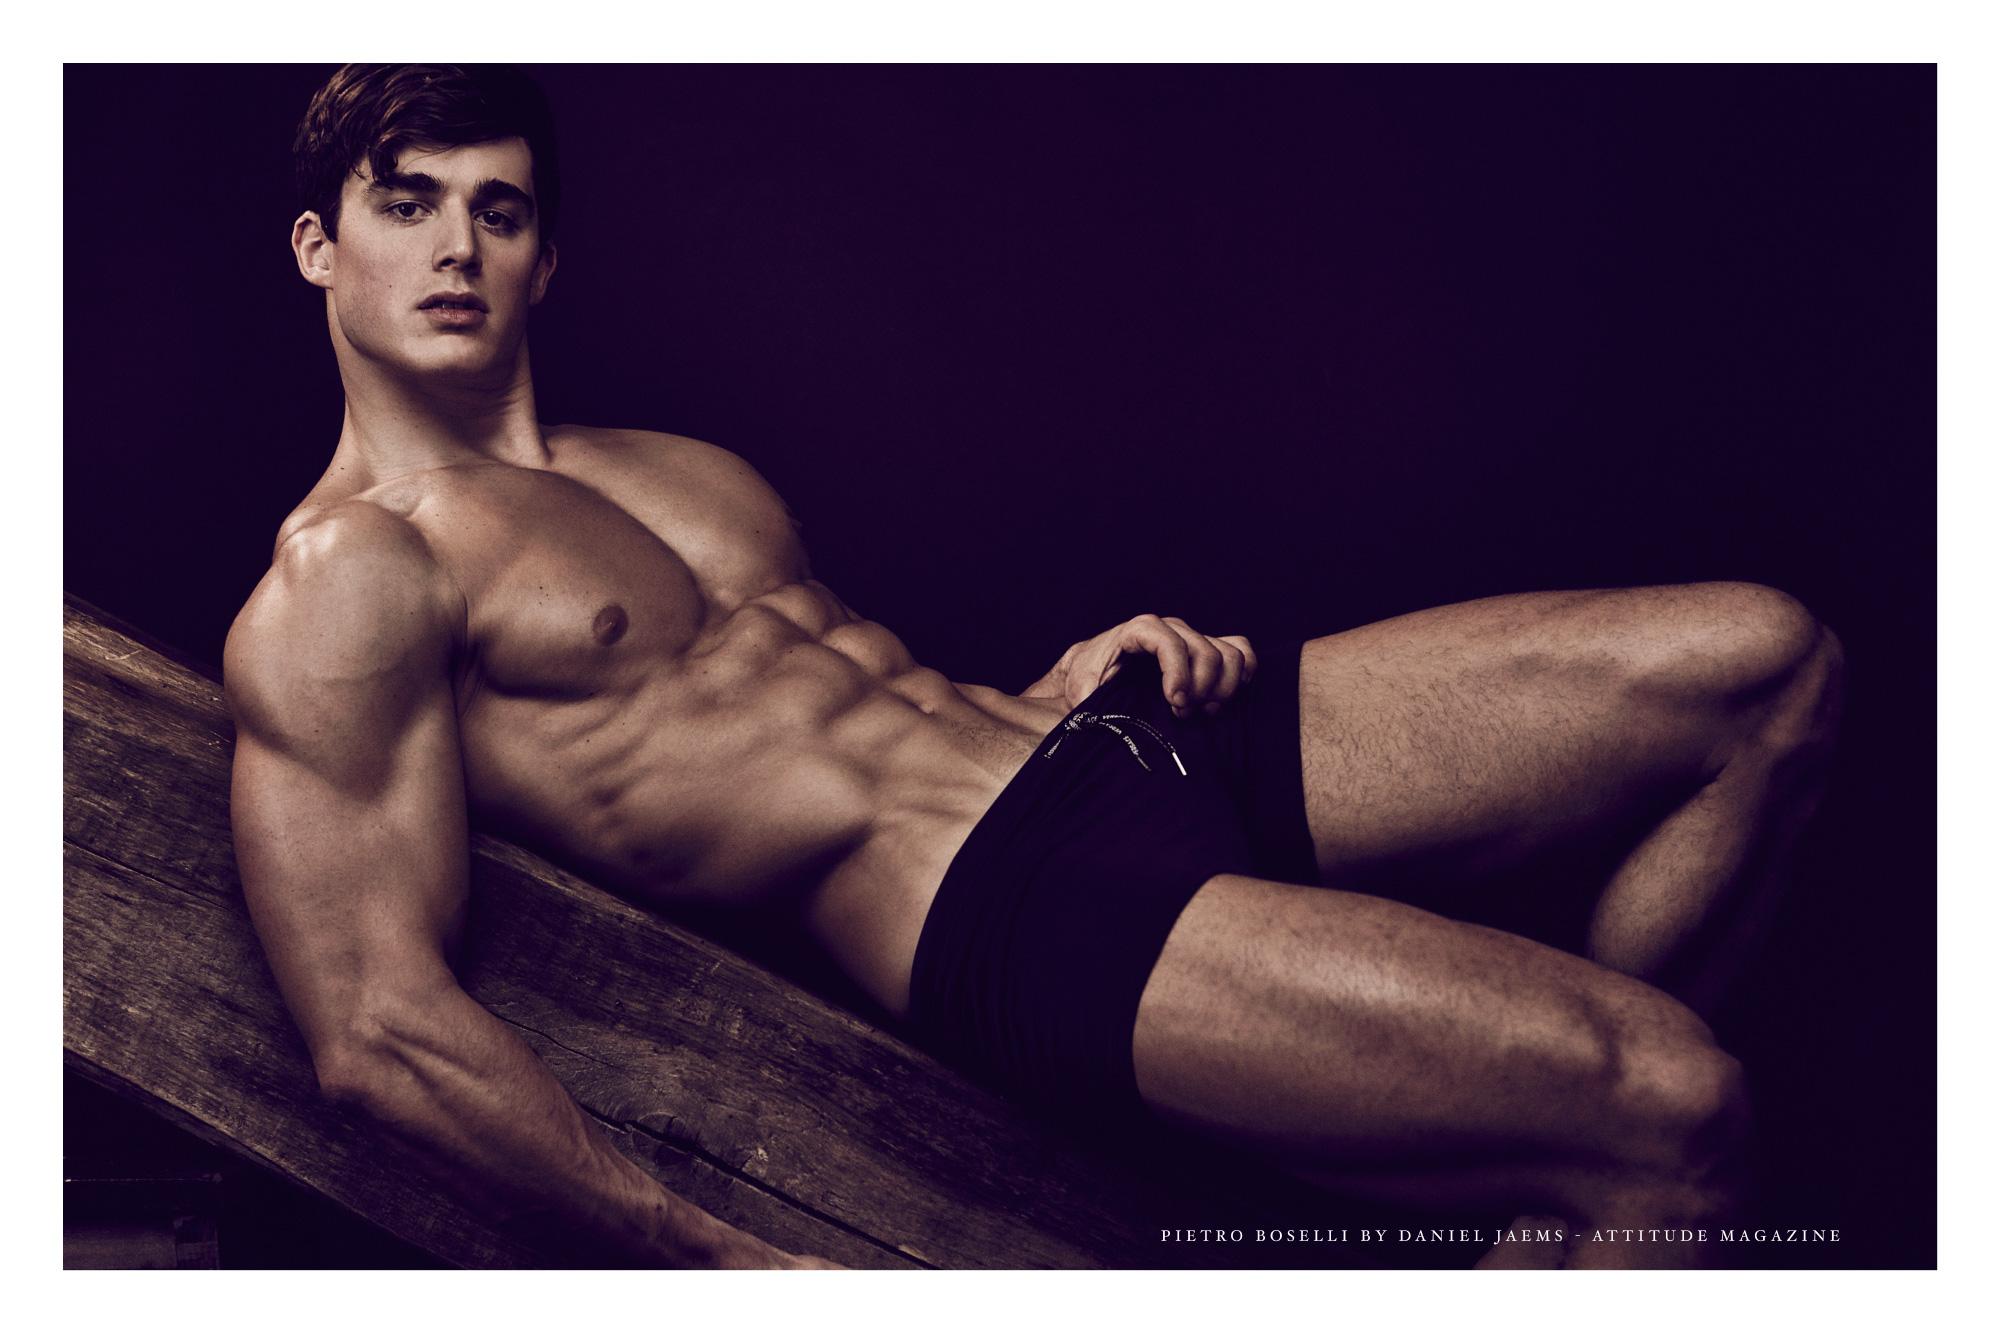 Pietro-Boselli-by-Daniel-Jaems-for-Attitude-Magazine-10